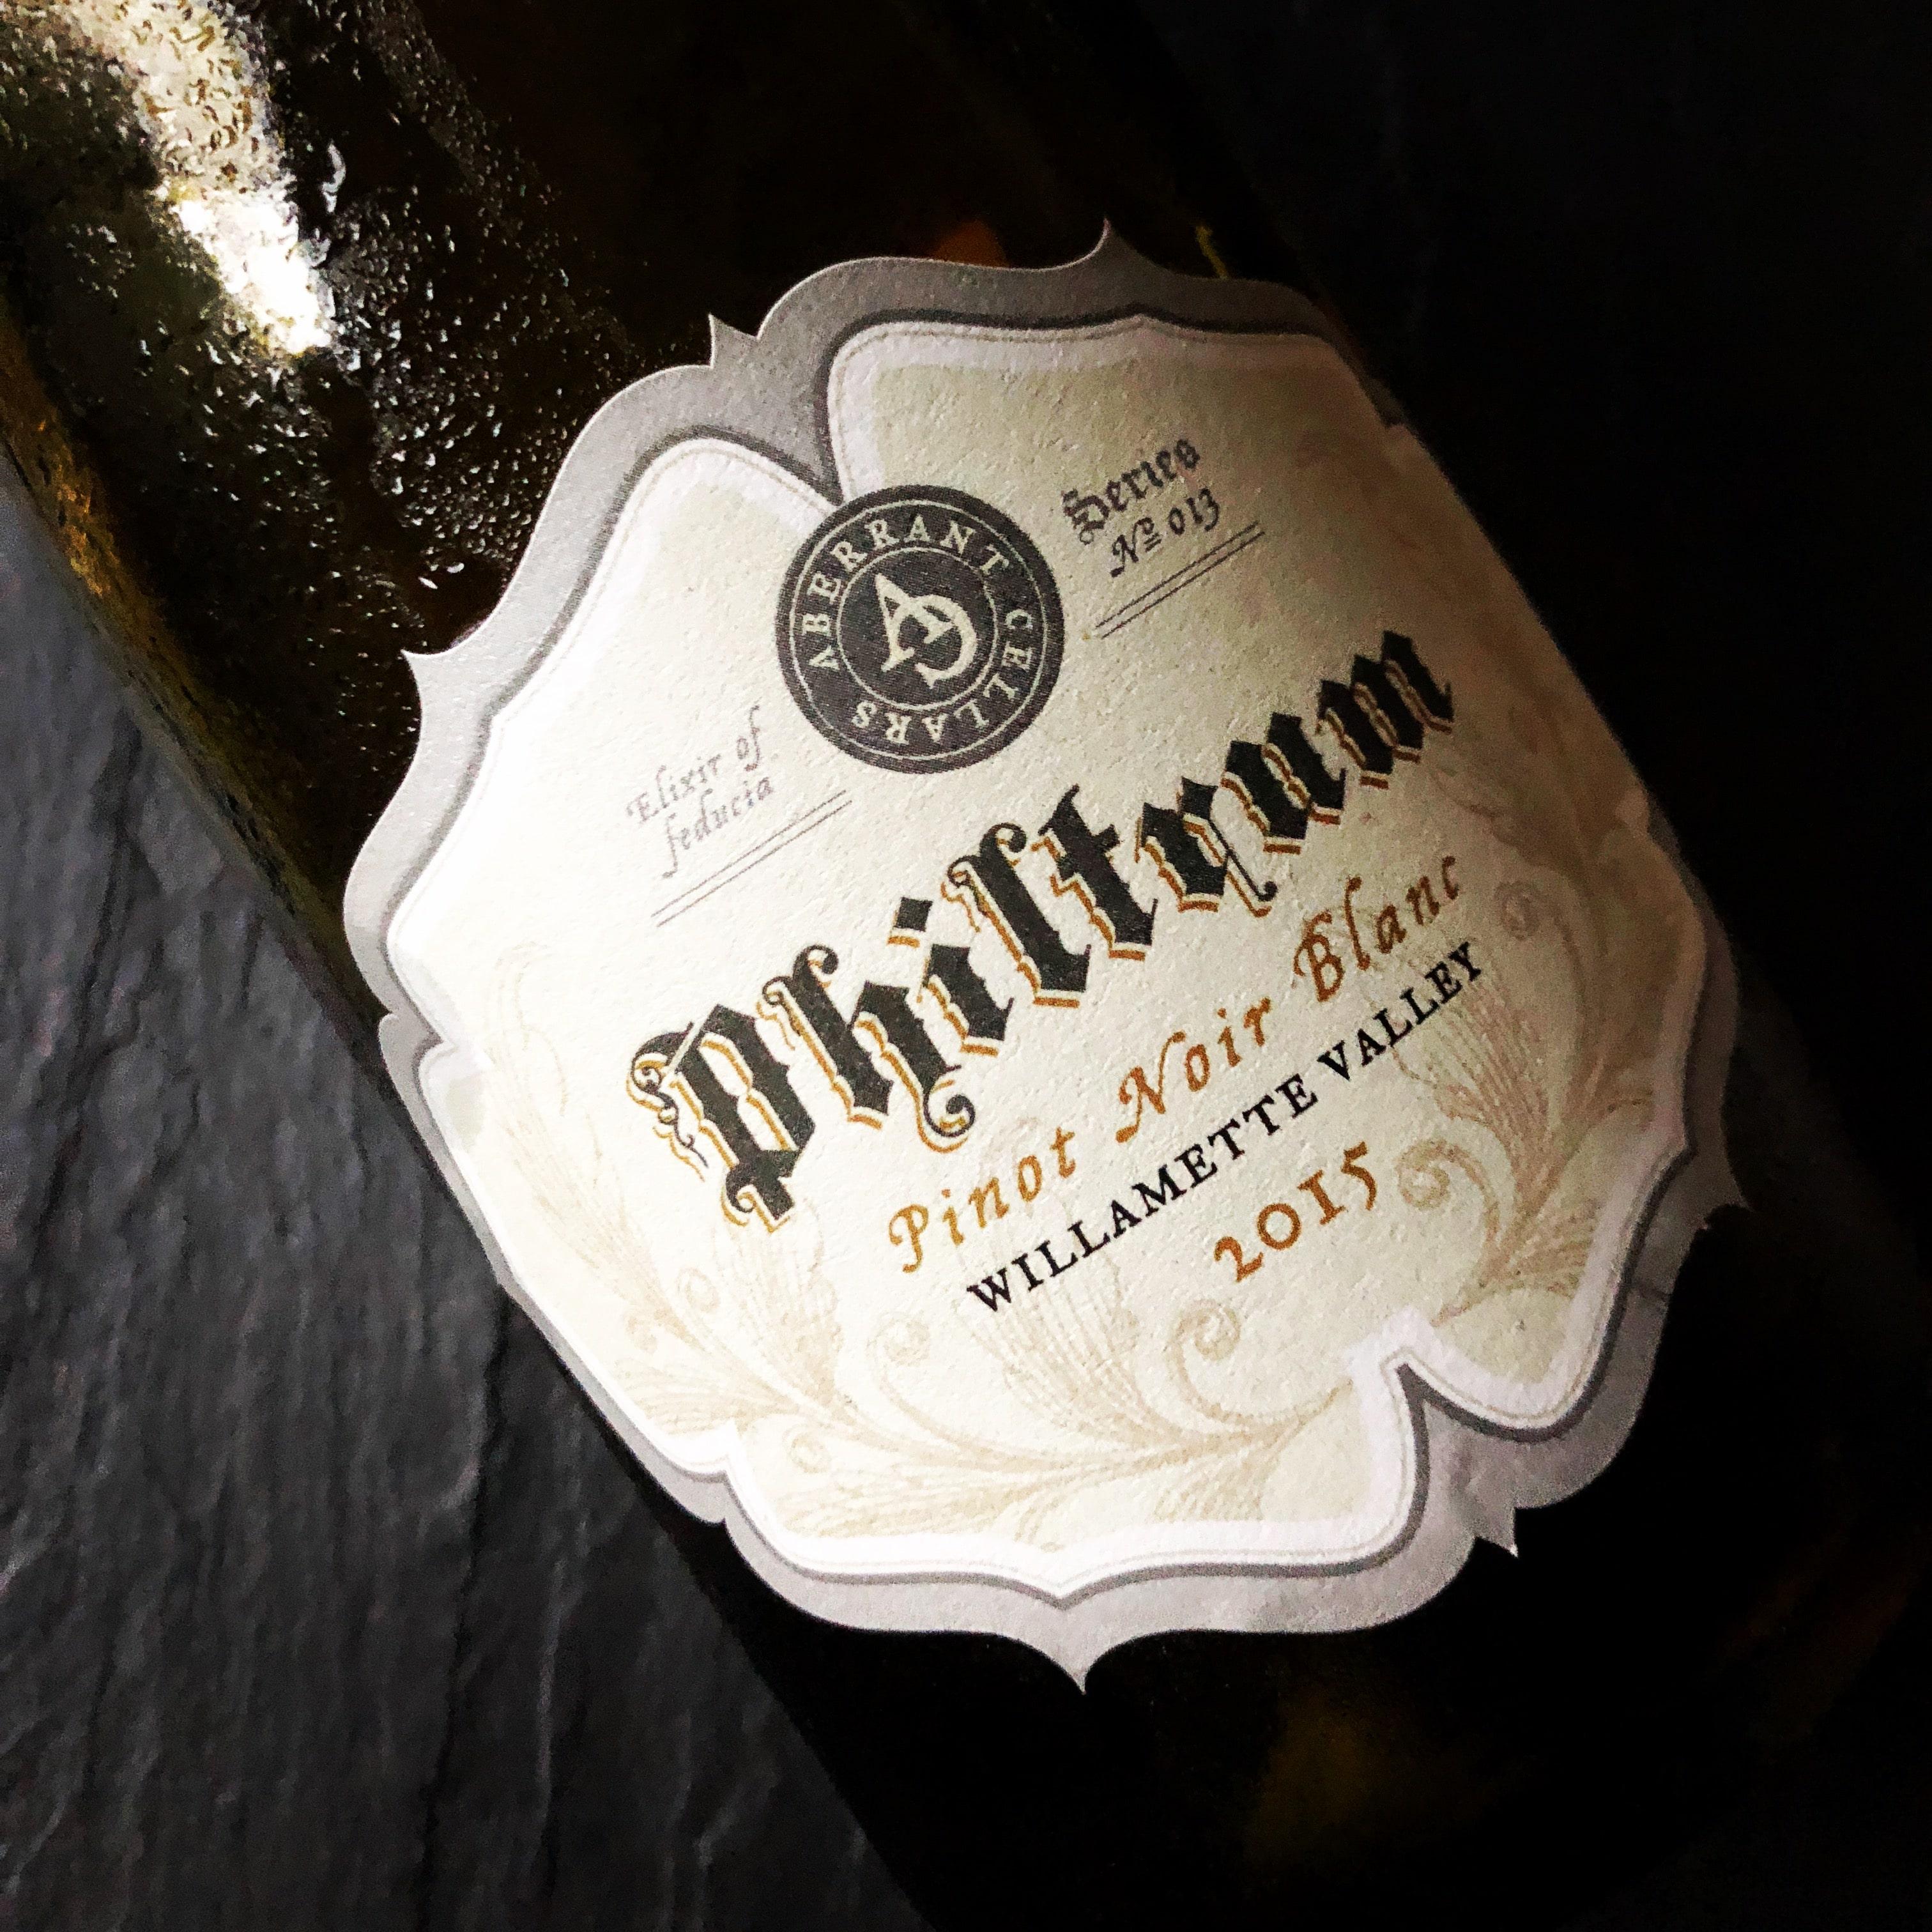 Aberrant Cellars Philtrum Pinot Noir Blanc 2015